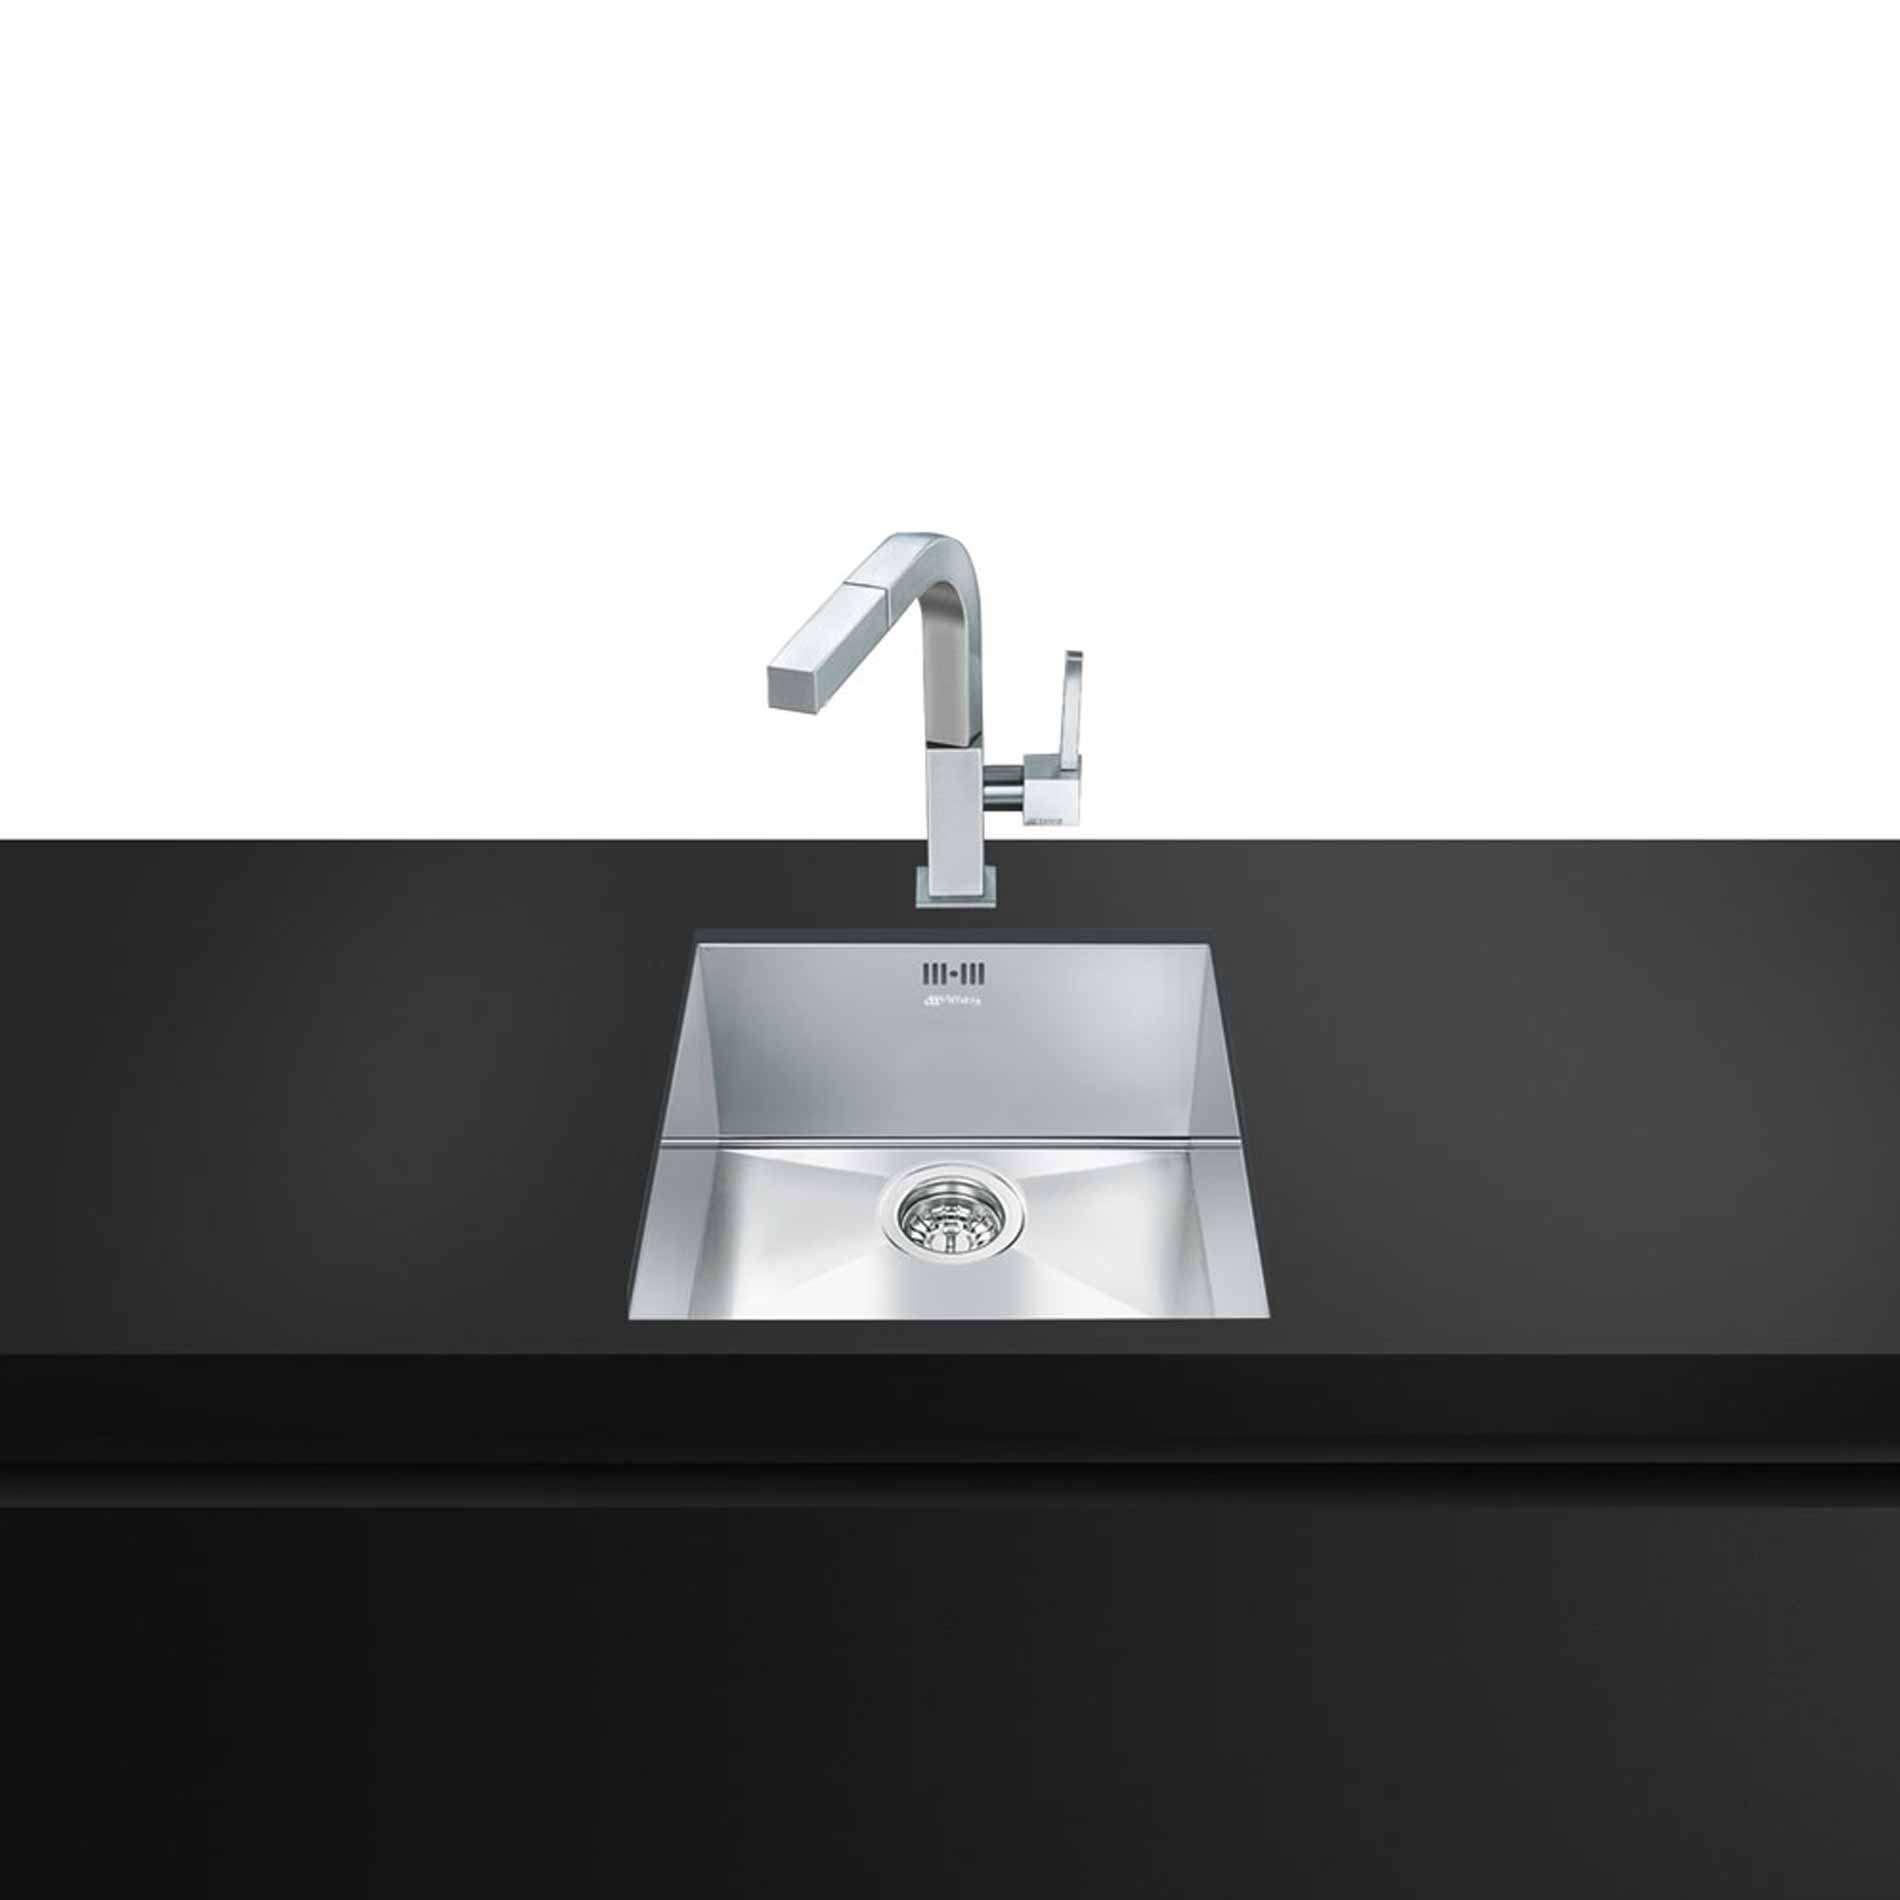 Square Undermount Sink : Smeg: VSTQ40-2 Quadra Square Undermount Sink - Kitchen Sinks & Taps